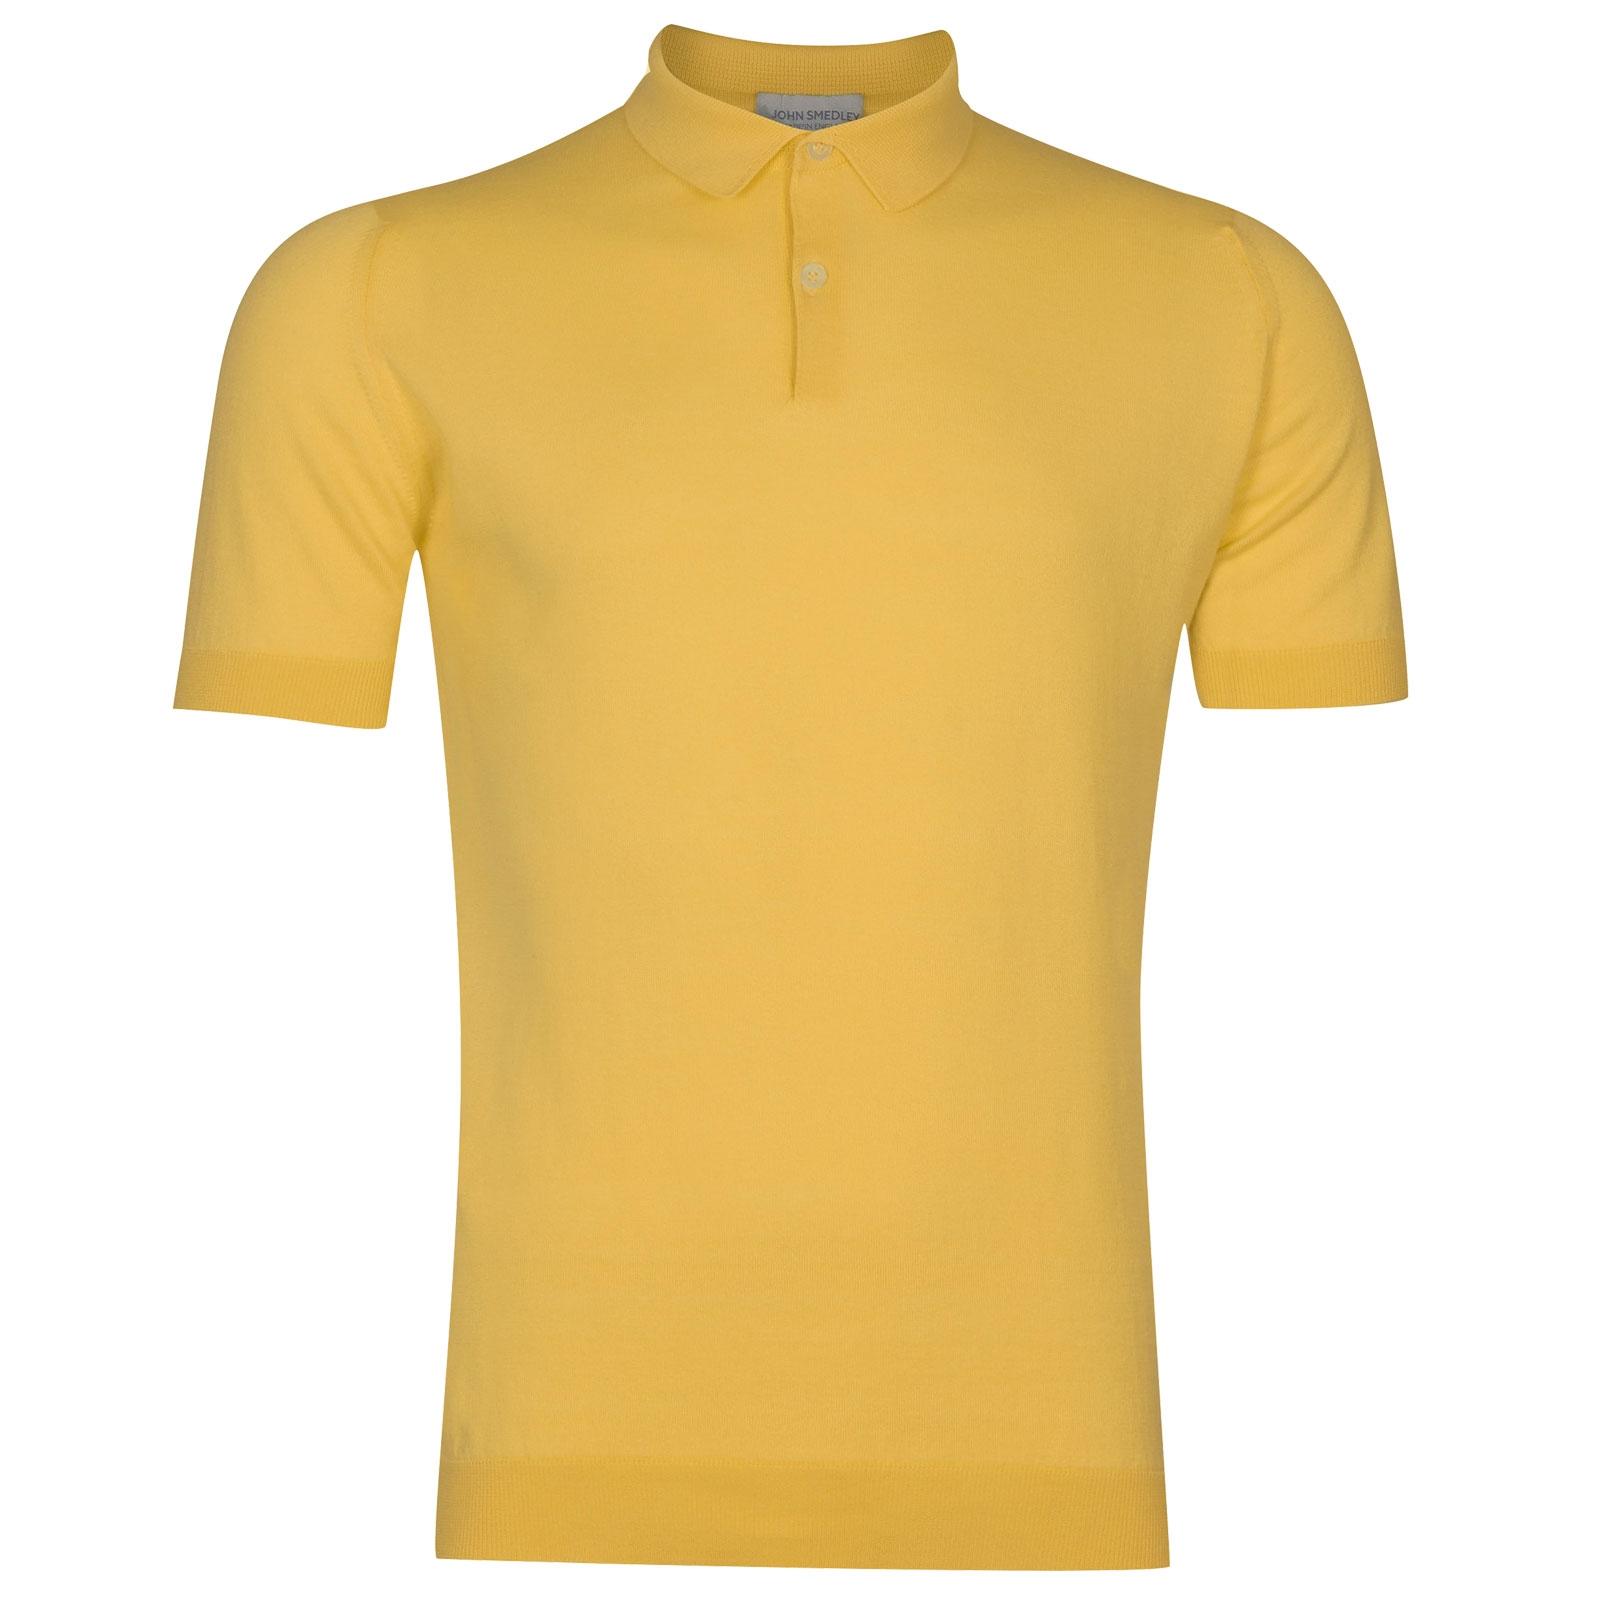 John Smedley Rhodes in Yellow Bloom Shirt-SML